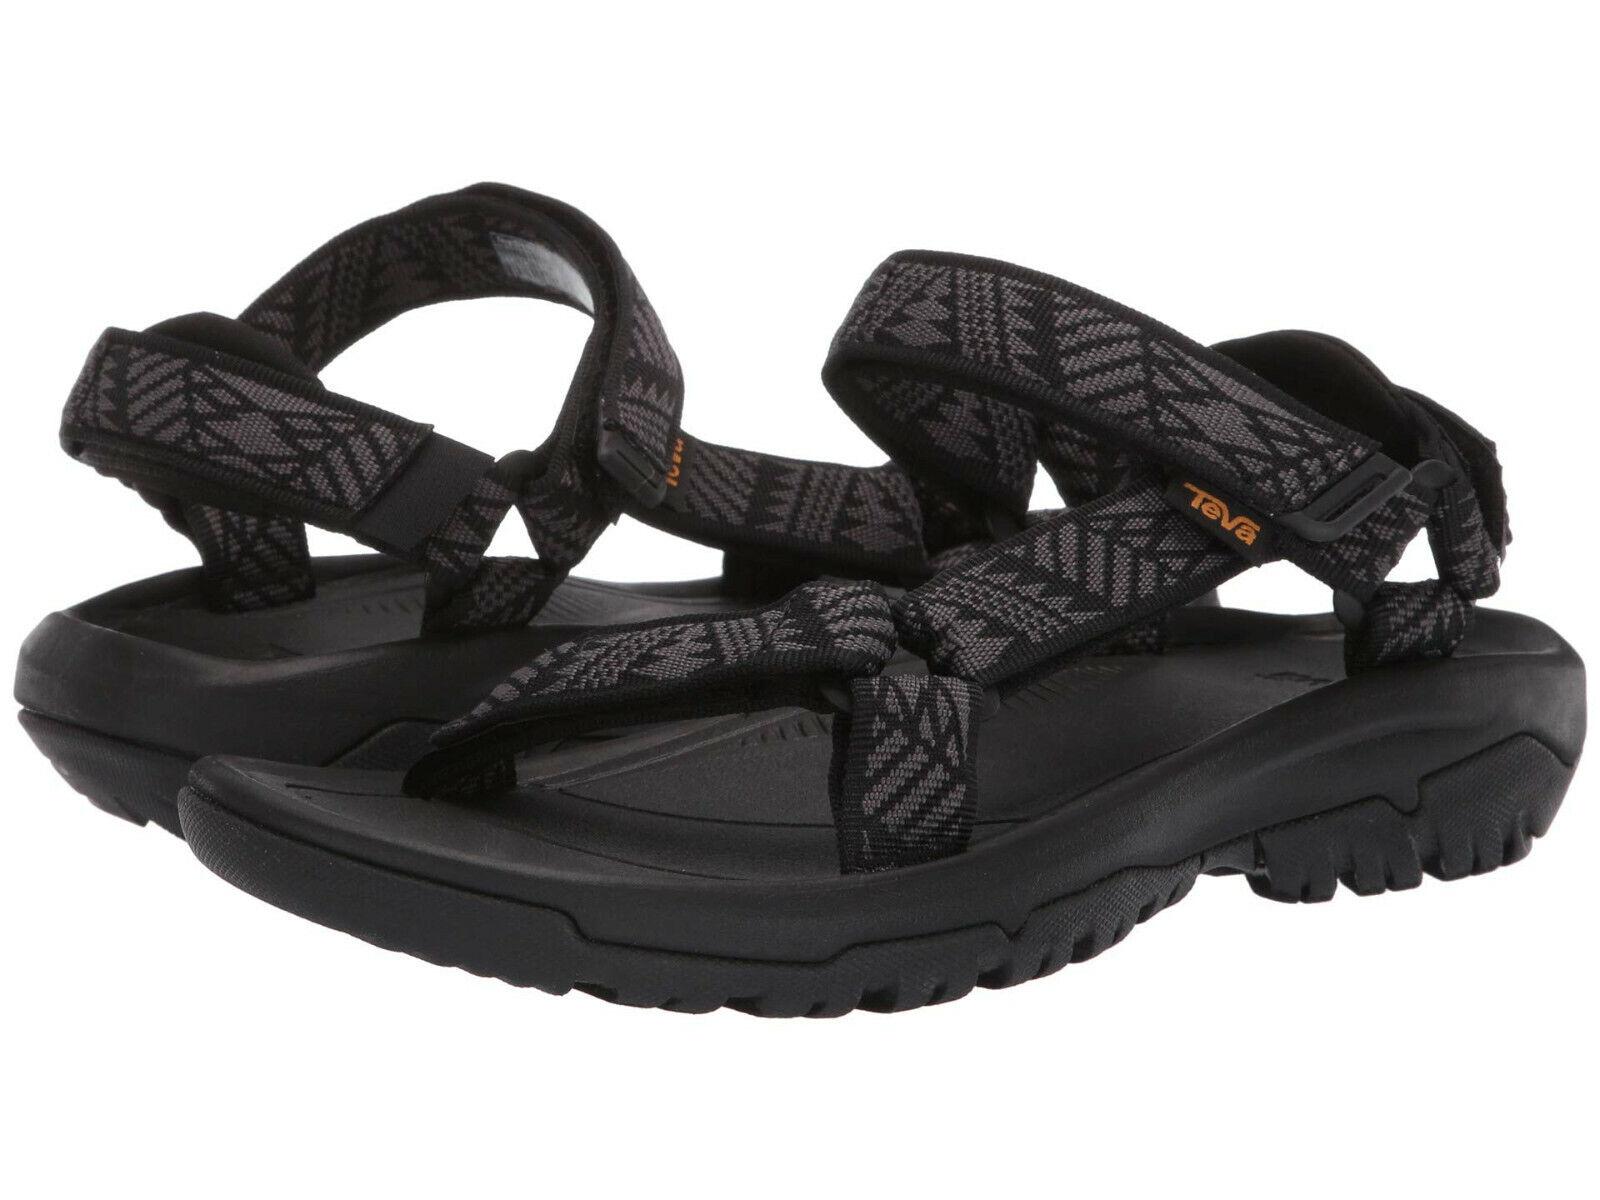 Teva Women's Hurricane XLT2 Sport Sandal Boomerang Black (Select Size)